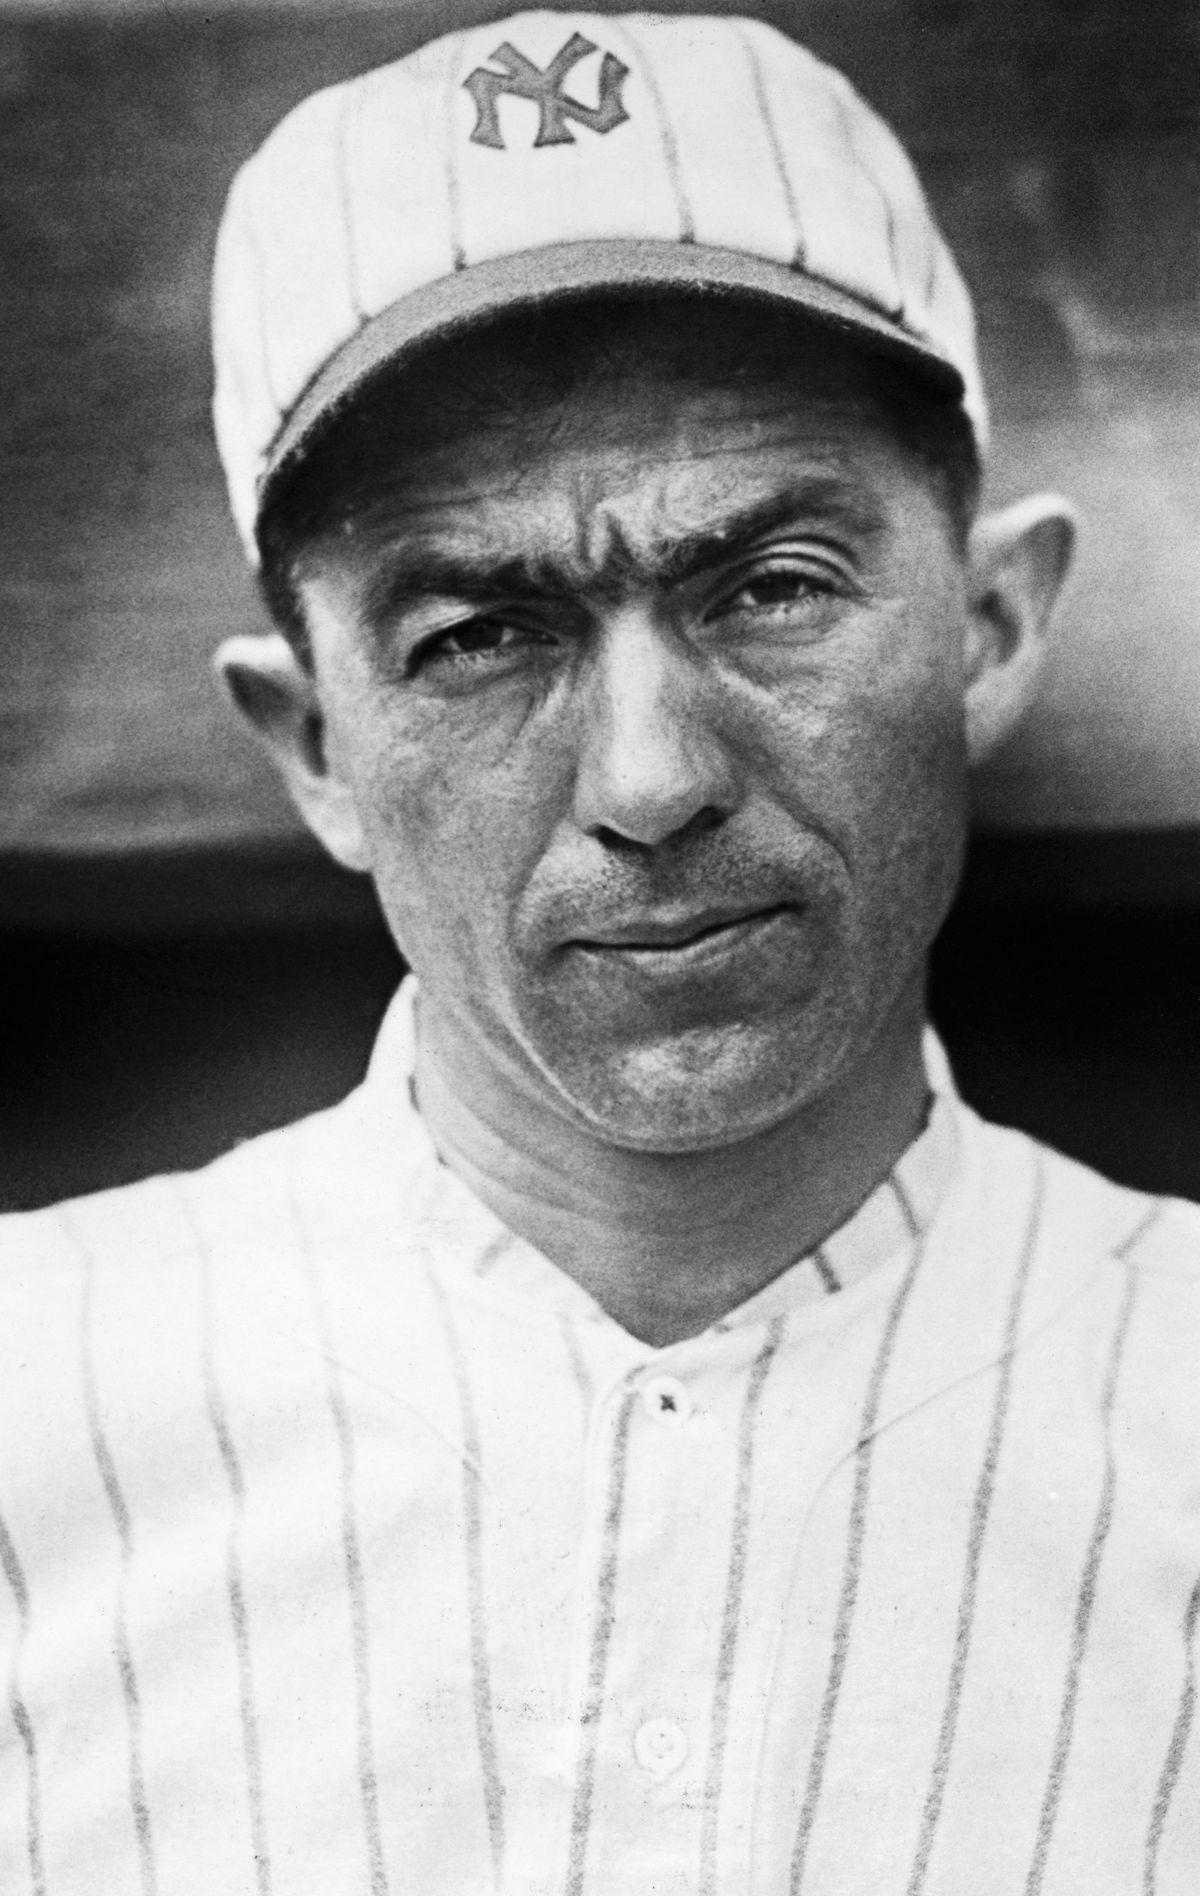 Portrait of Franklin Baker in Baseball Uniform